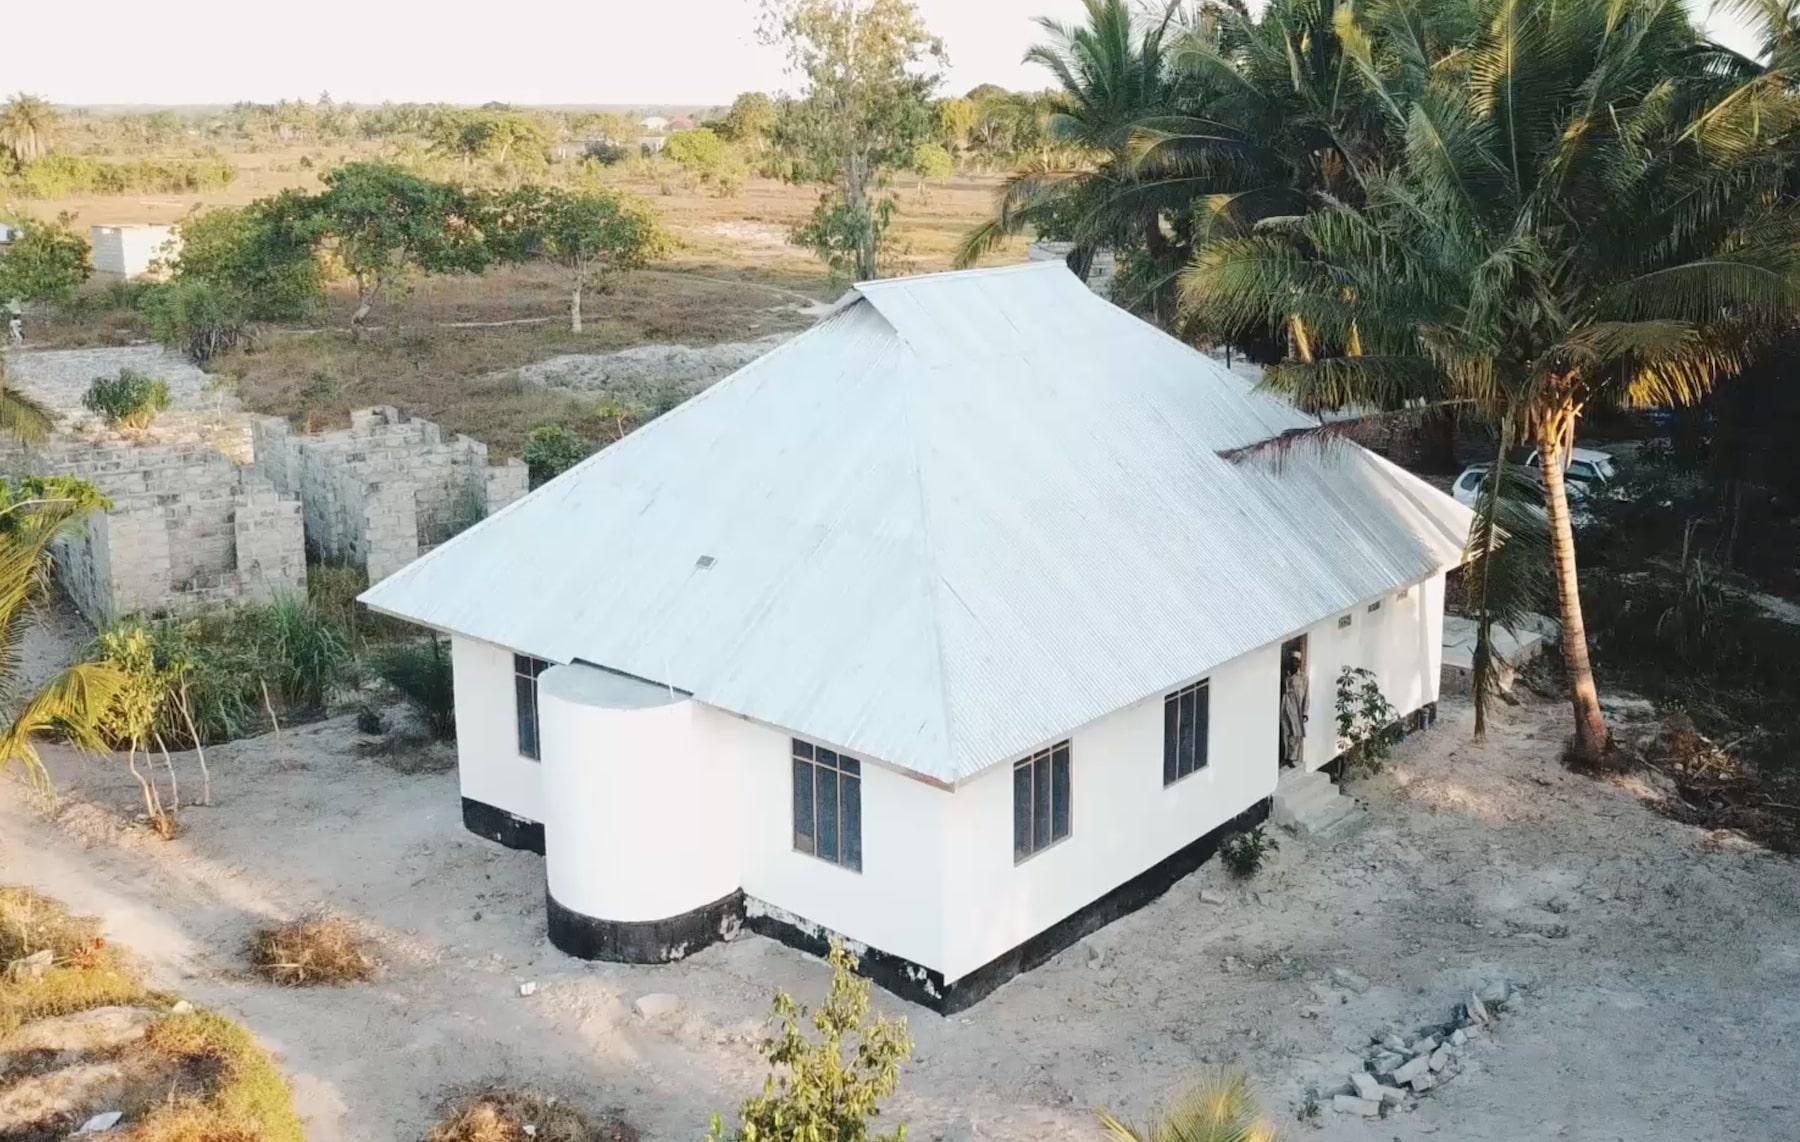 An under construction mosque in Tanzania